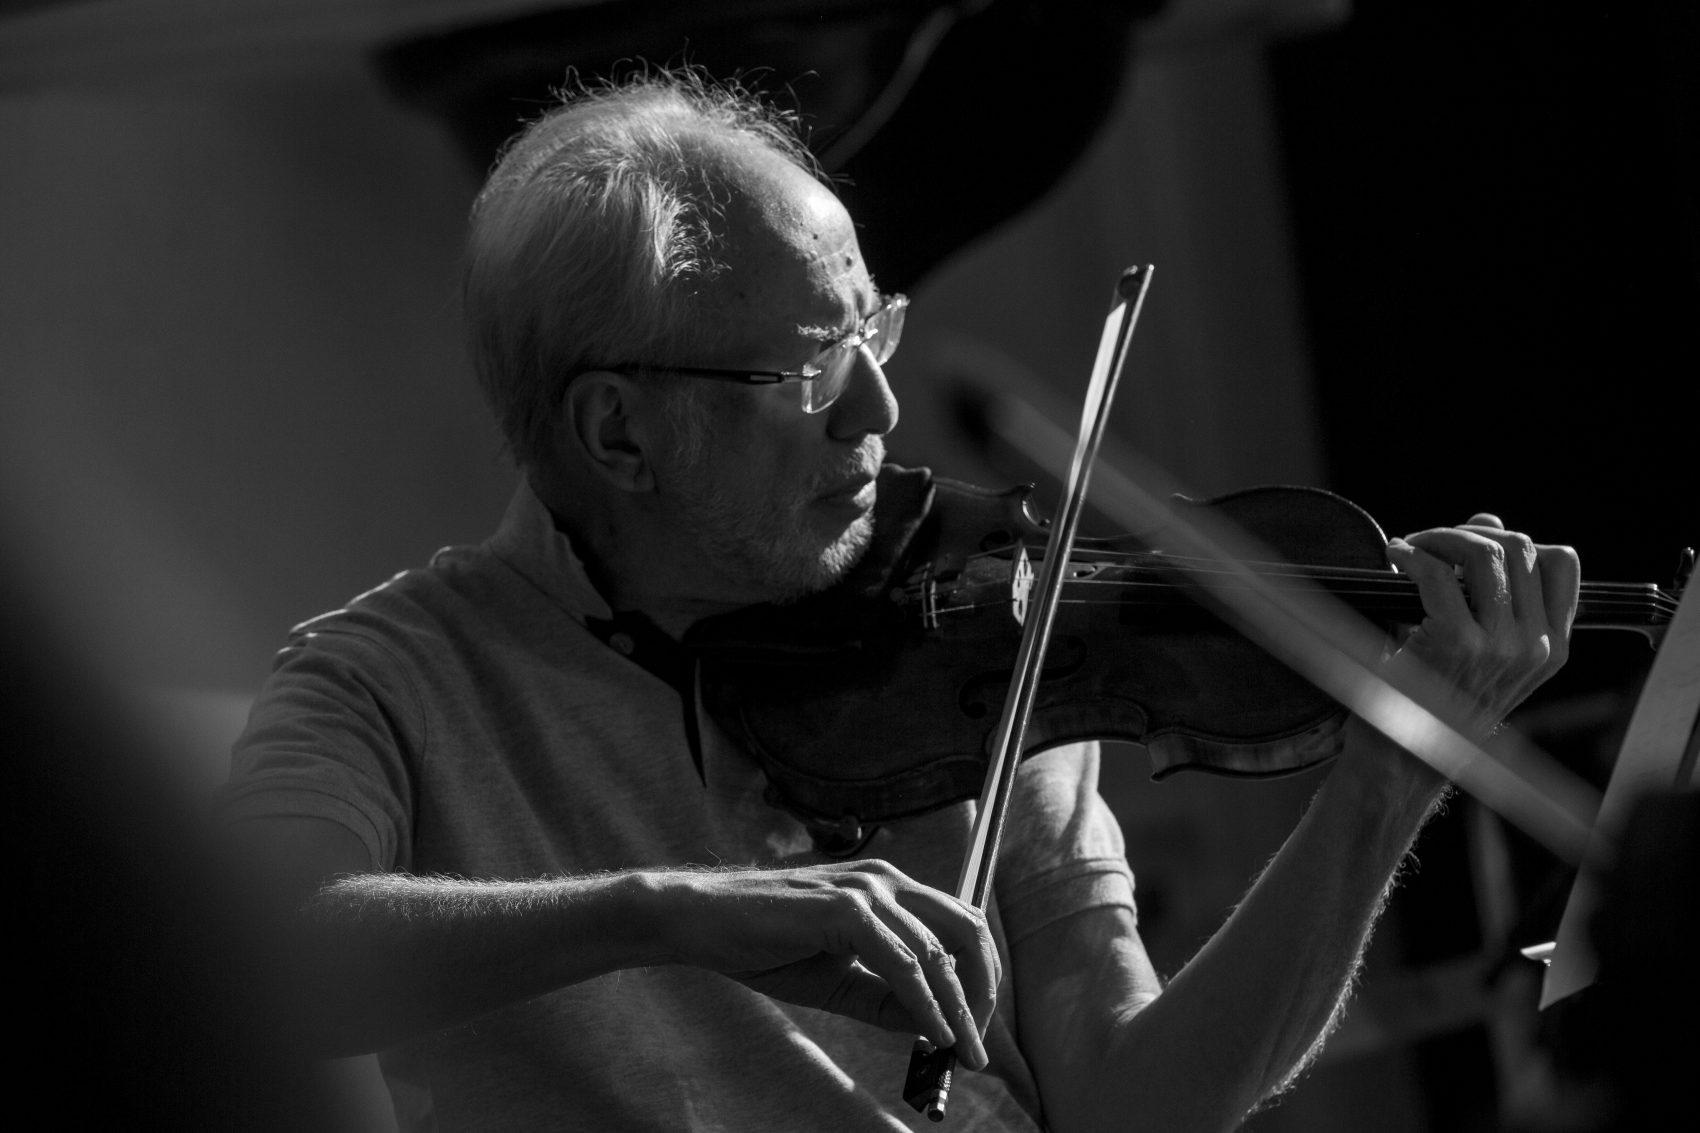 Violinist Gidon Kremer. (Courtesy Paolo Pellegrin/Magnum Photos)